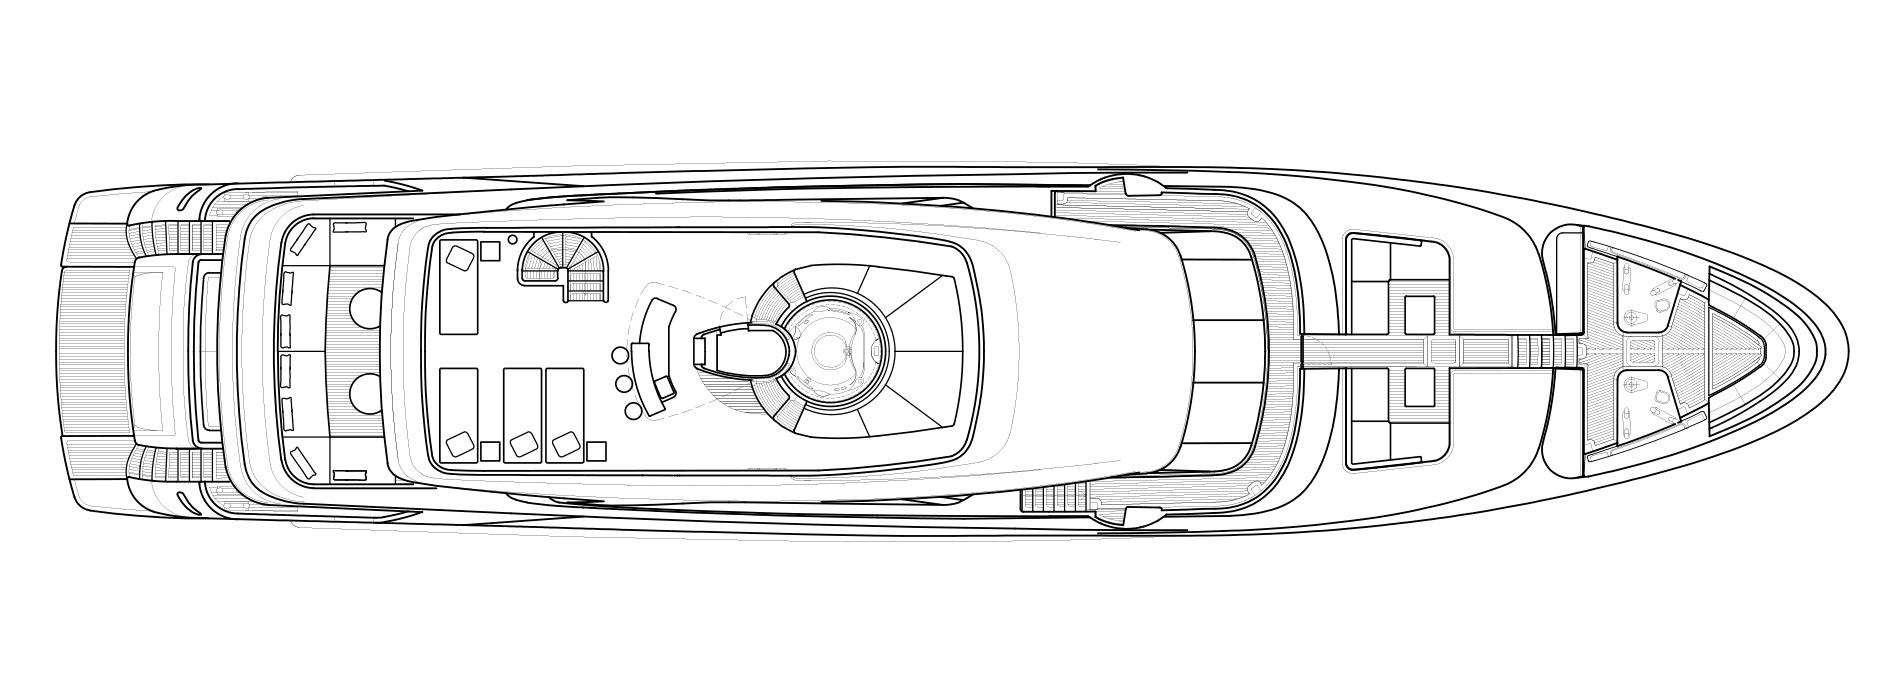 Sanlorenzo SD126 Flybridge Option A